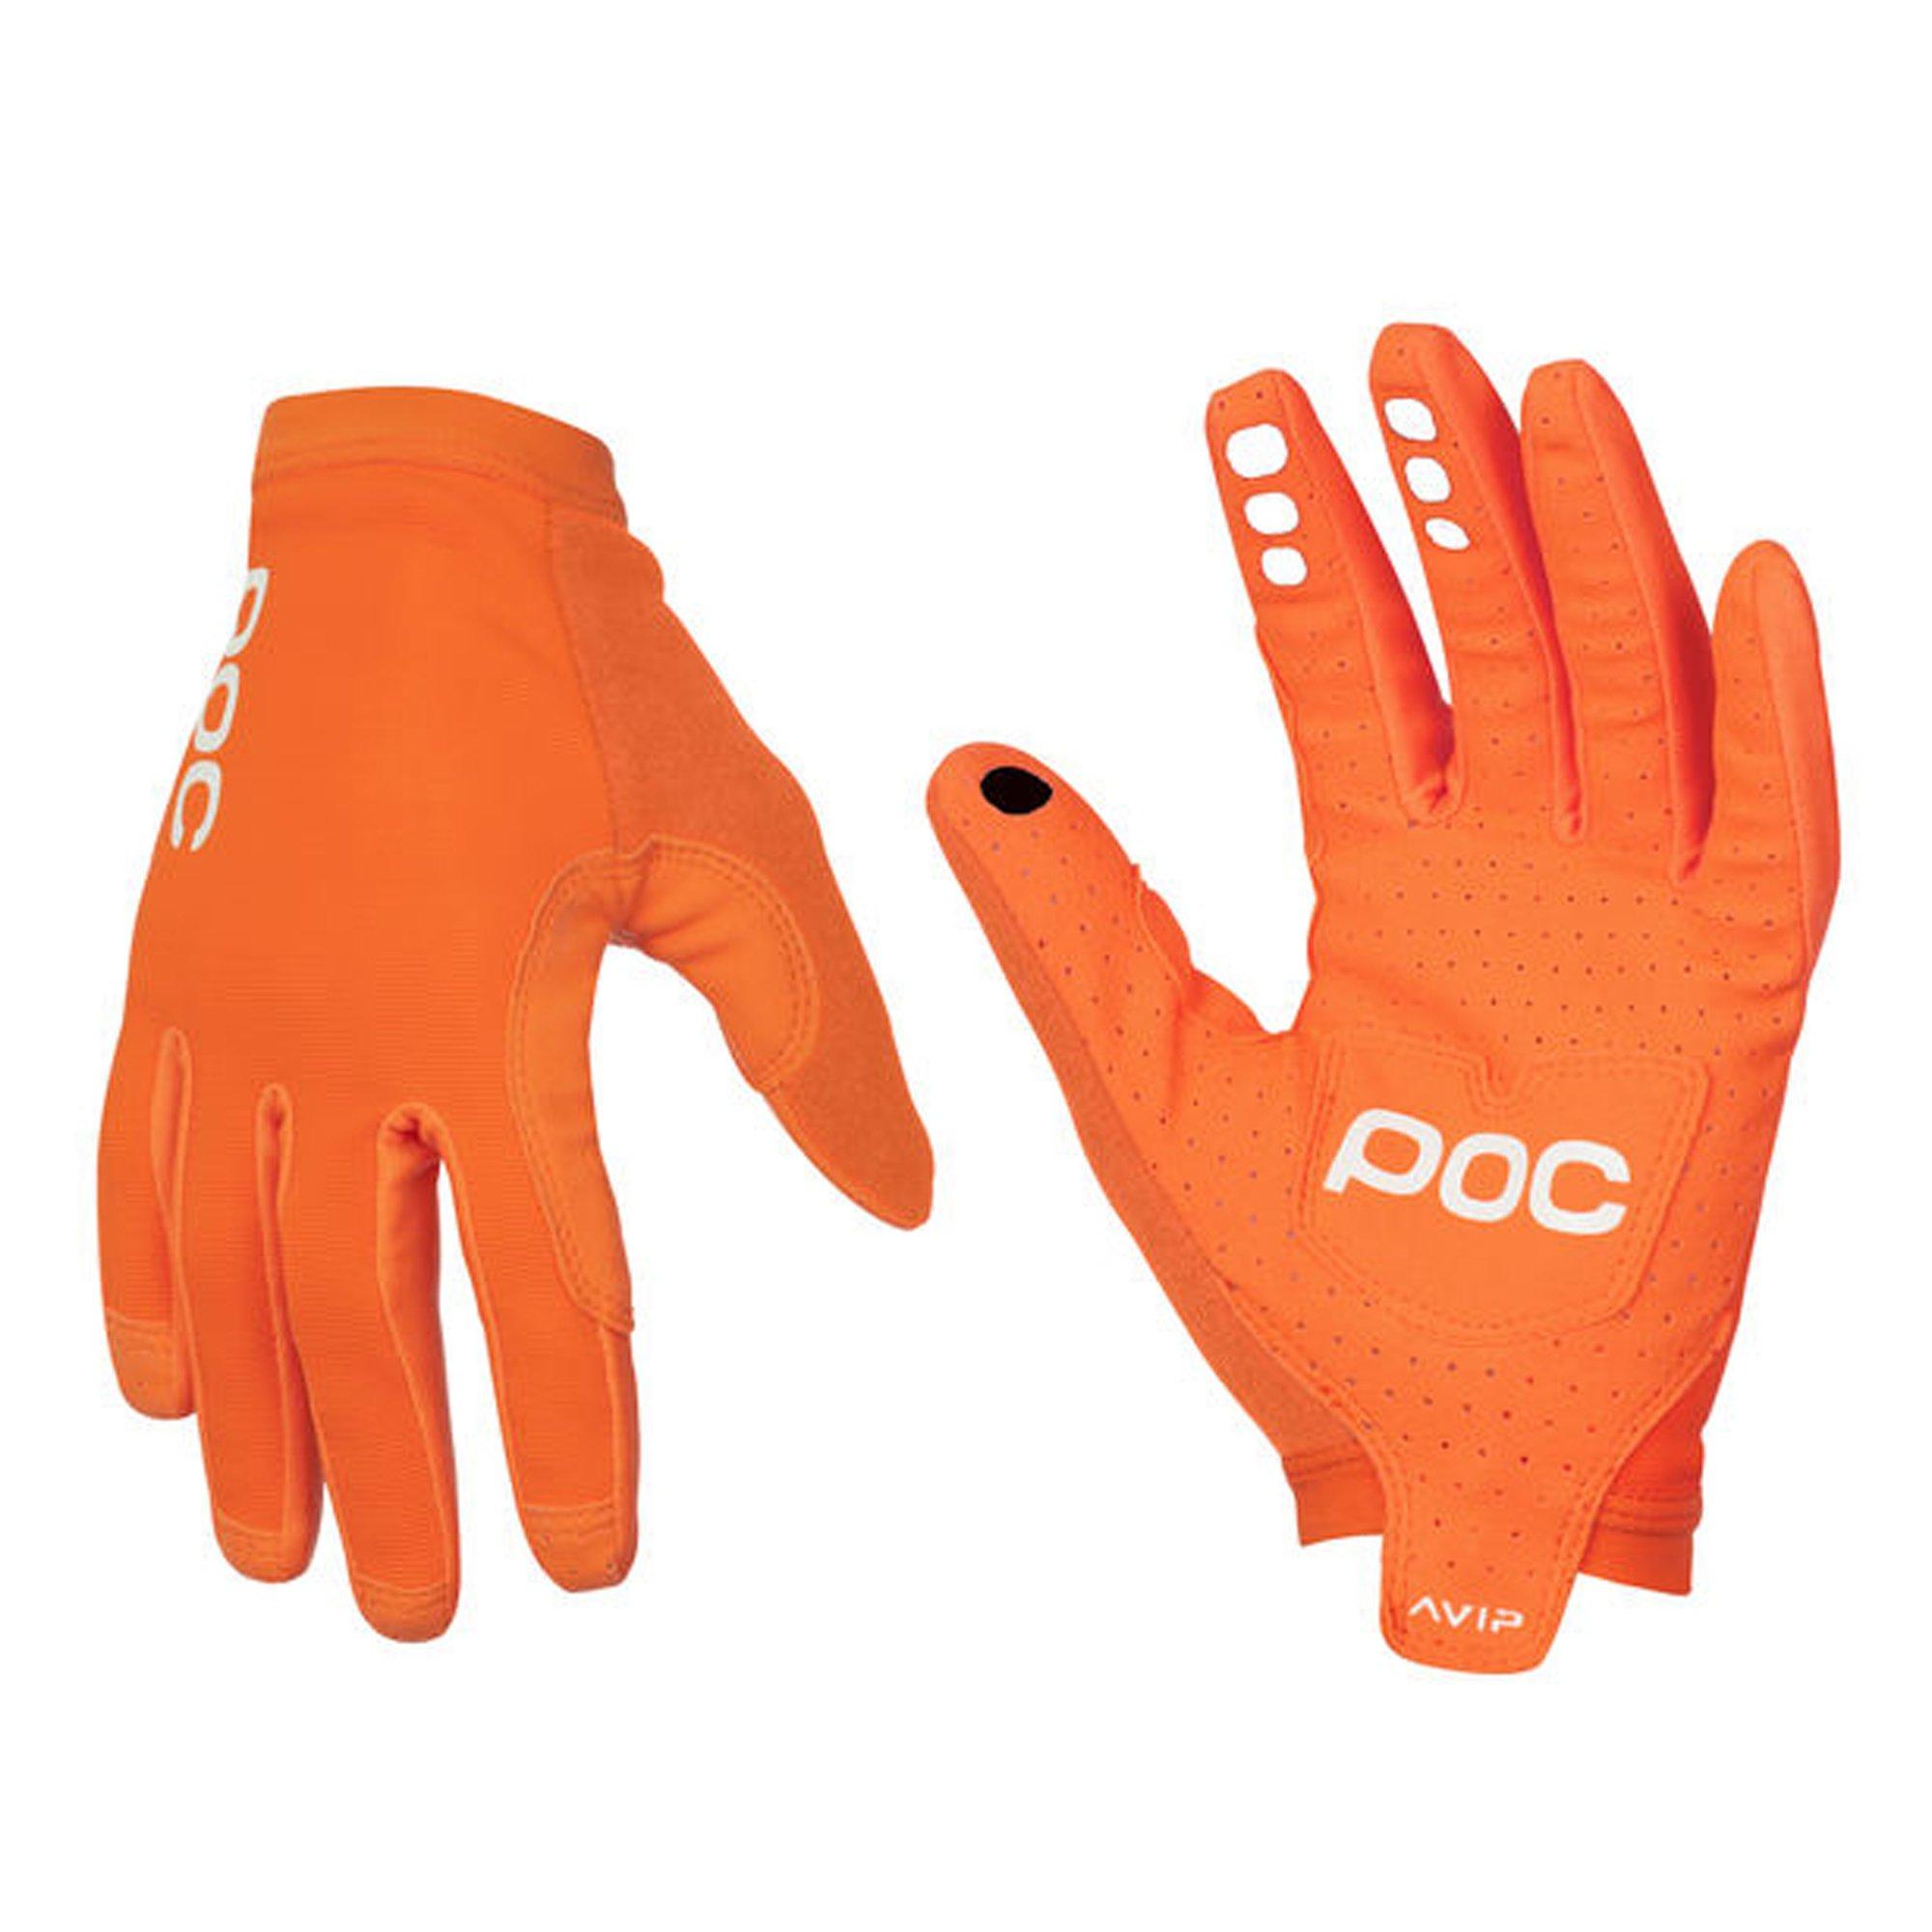 POC - AVIP Glove Long, Cycling Gloves, Zink Orange, L